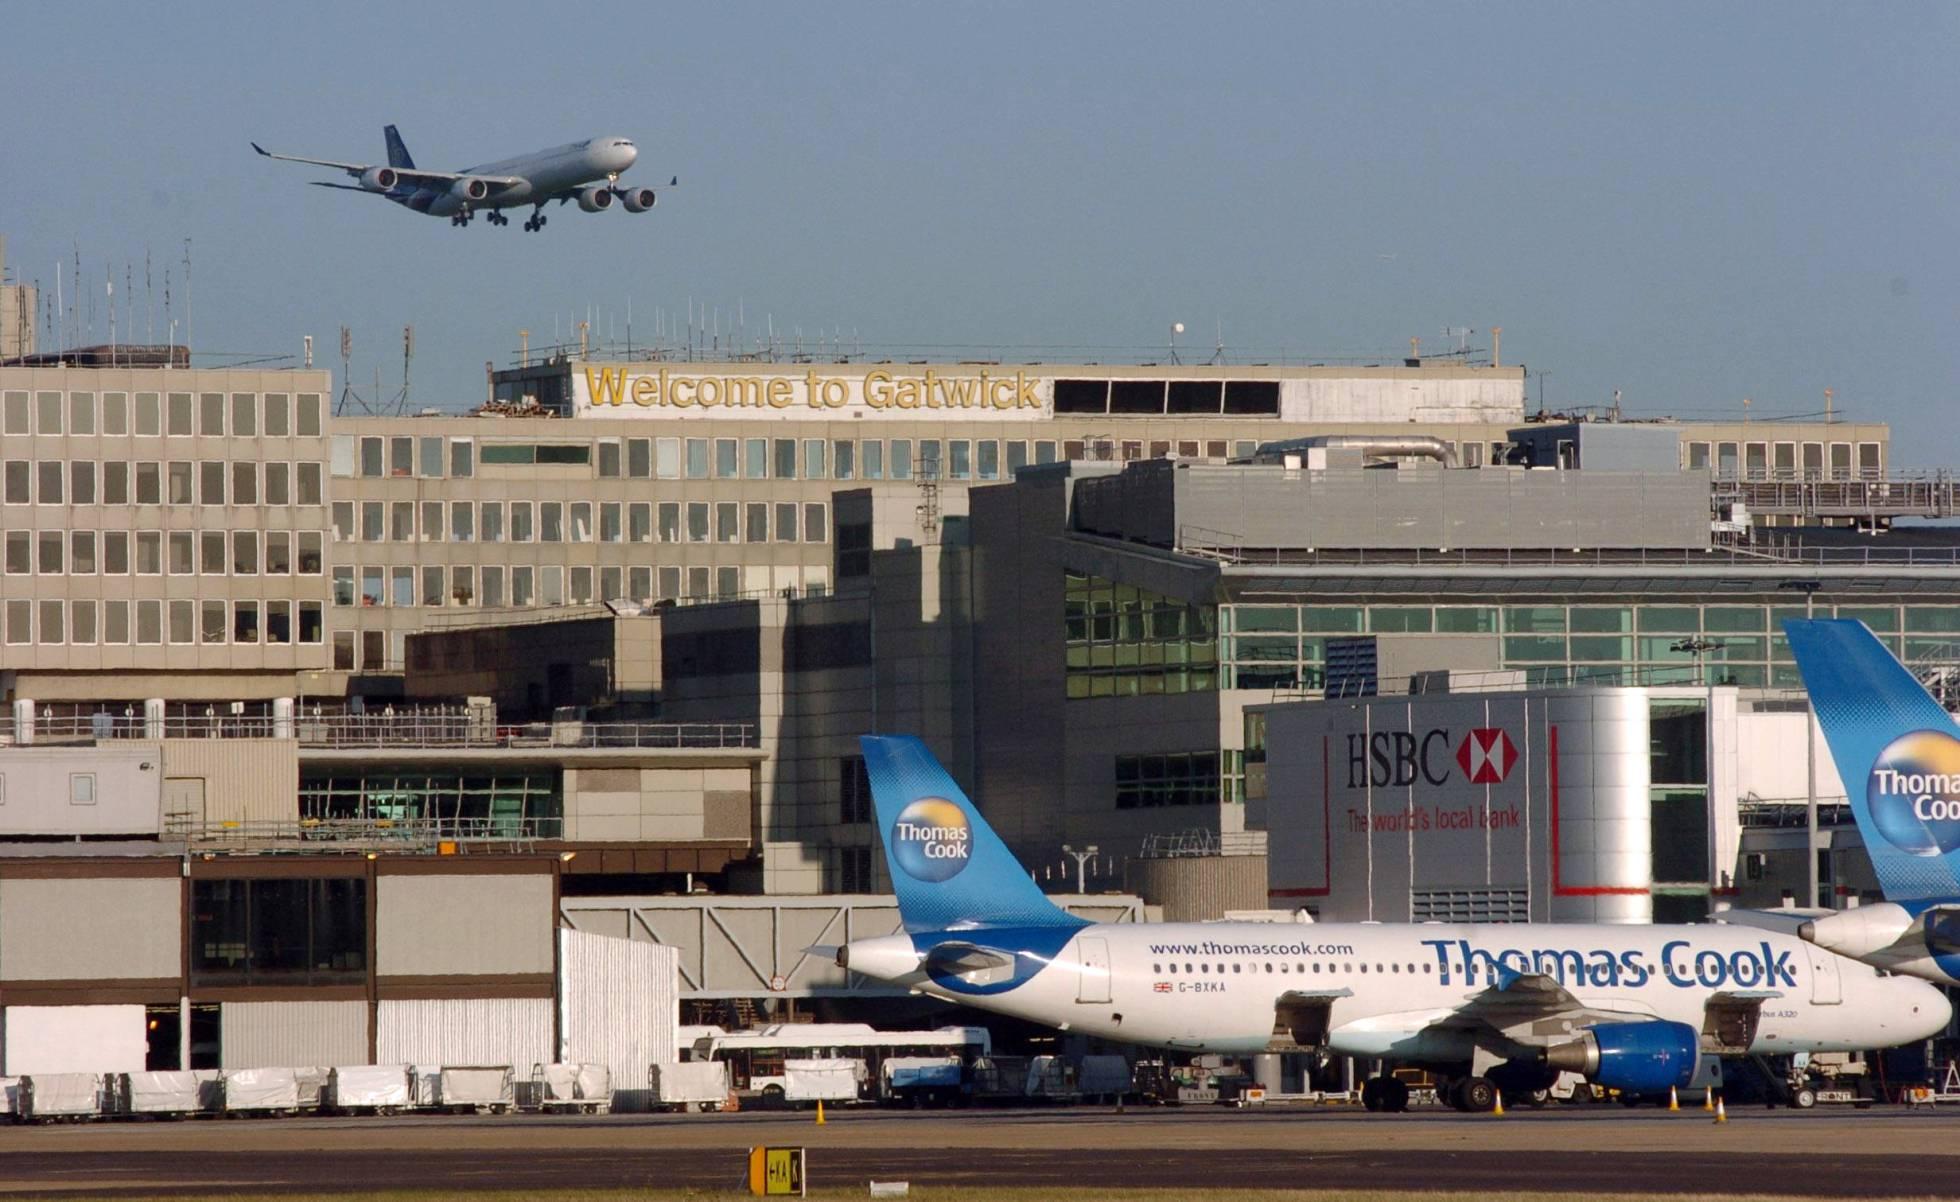 Un fallo informático causa colas en grandes aeropuertos